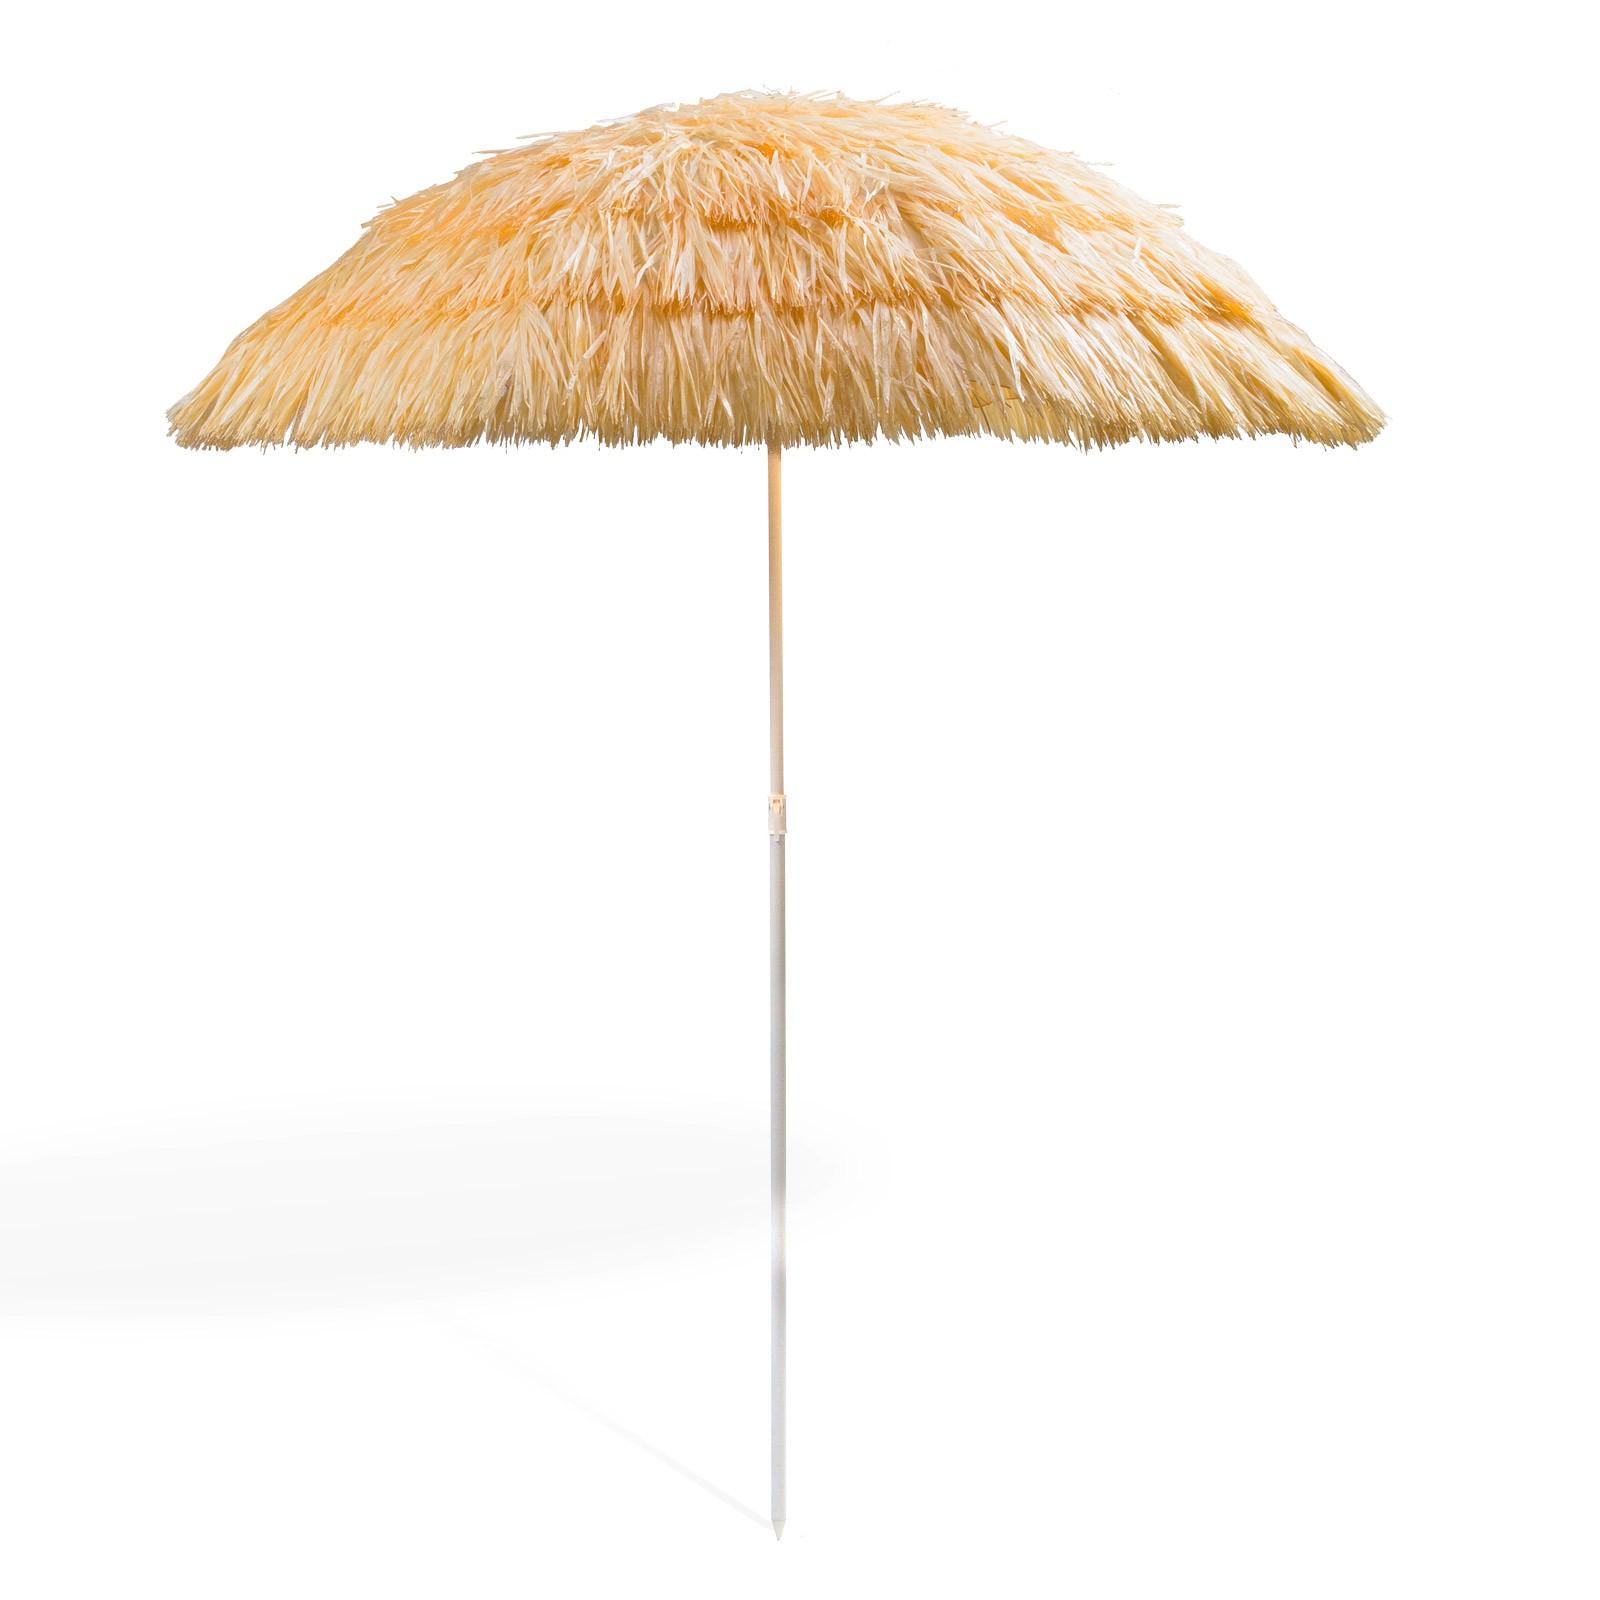 hawaii sonnenschirm strohschirm natur 160 cm uv 30. Black Bedroom Furniture Sets. Home Design Ideas